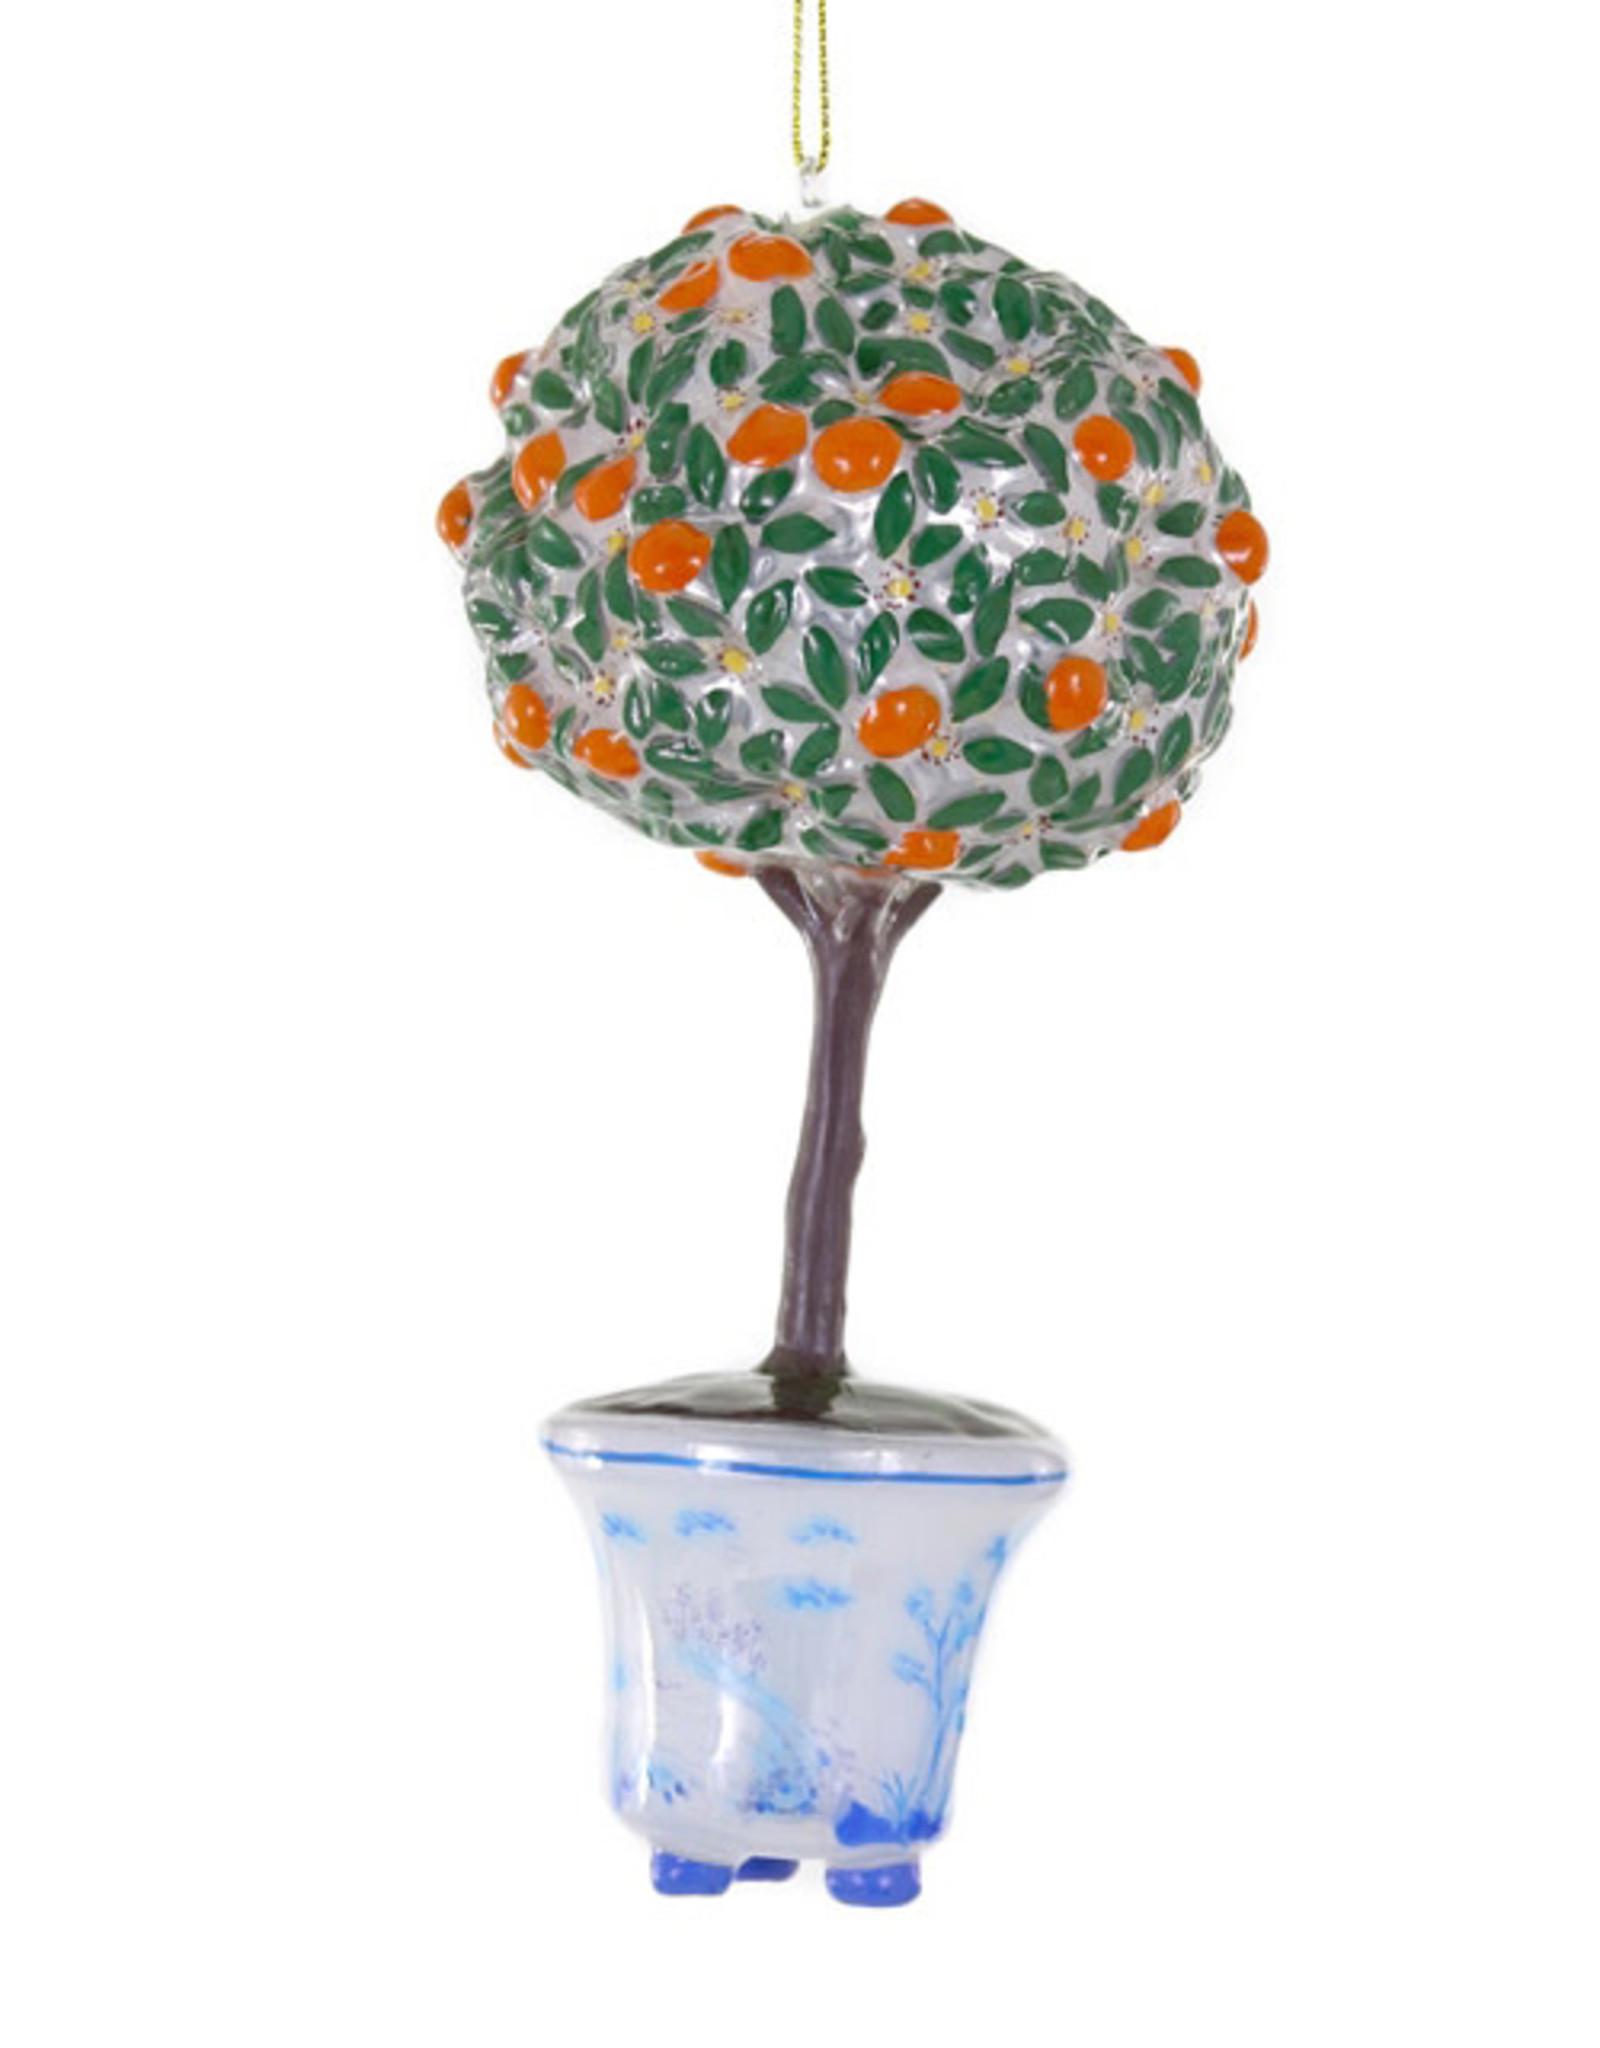 Cody Foster & Co. ORANGERIE TREE ORNAMENT